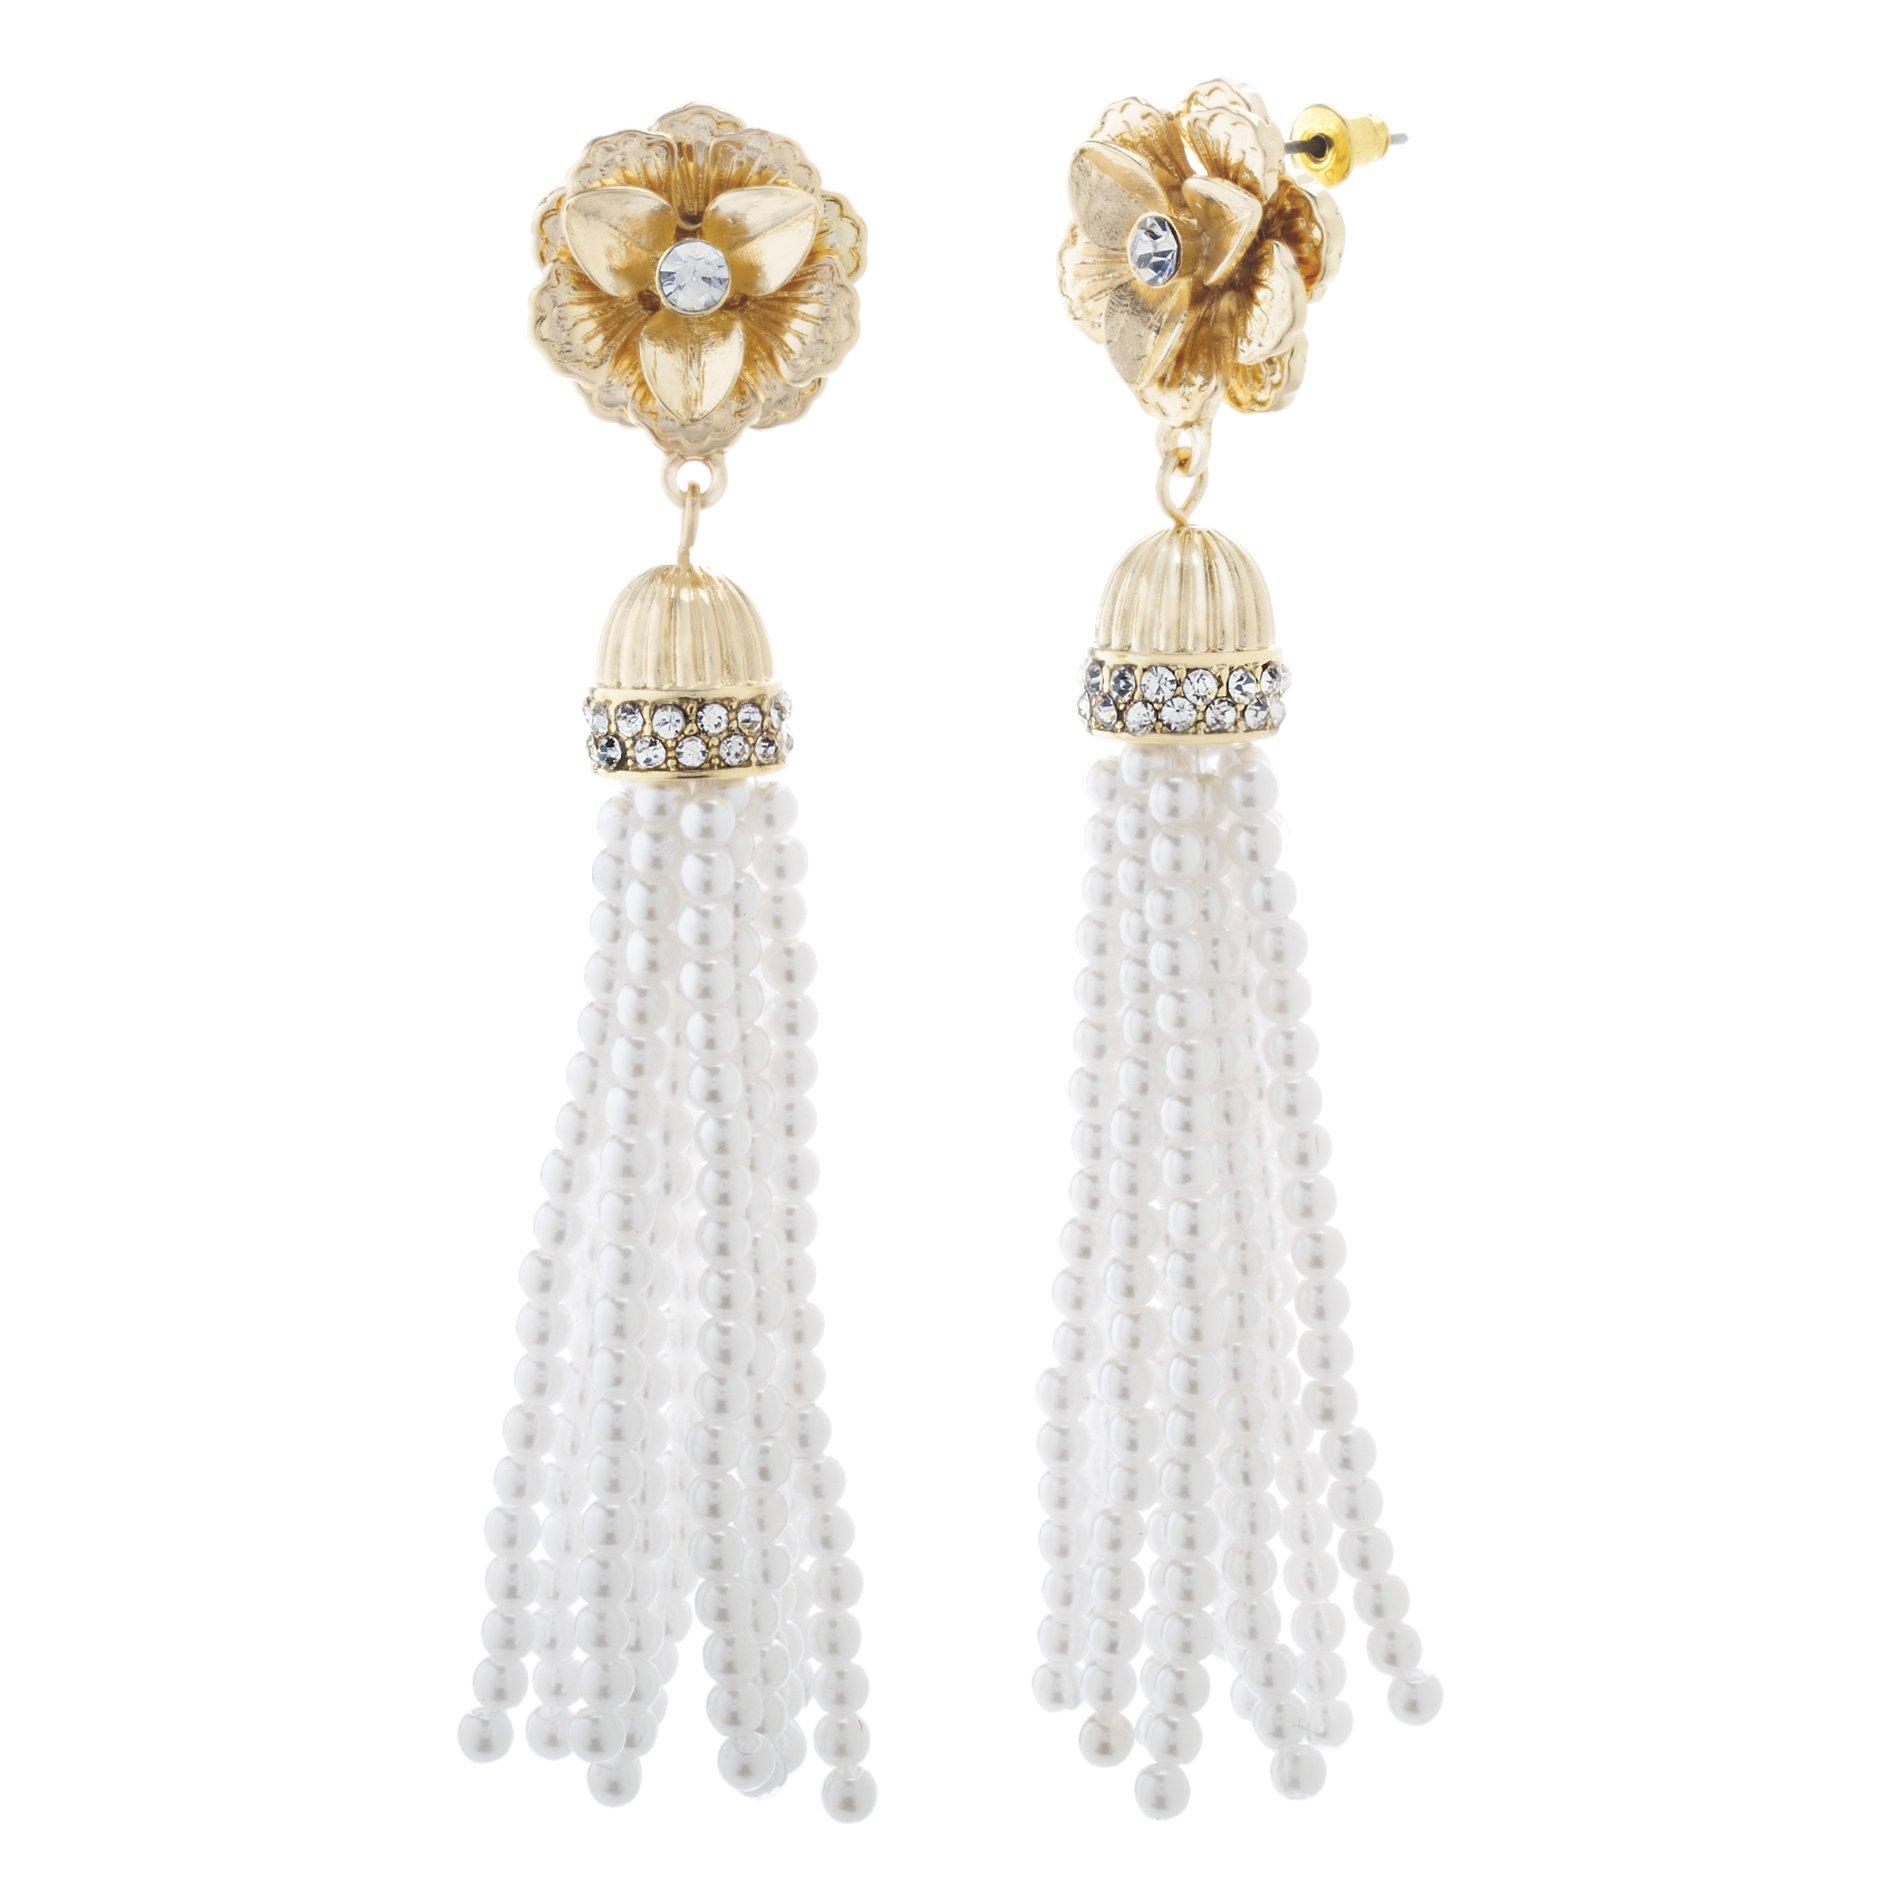 Catherine Malandrino Women's Rhinestone Flower Style Beaded Simulated Pearl Yellow Gold-Tone Tassel Earrings